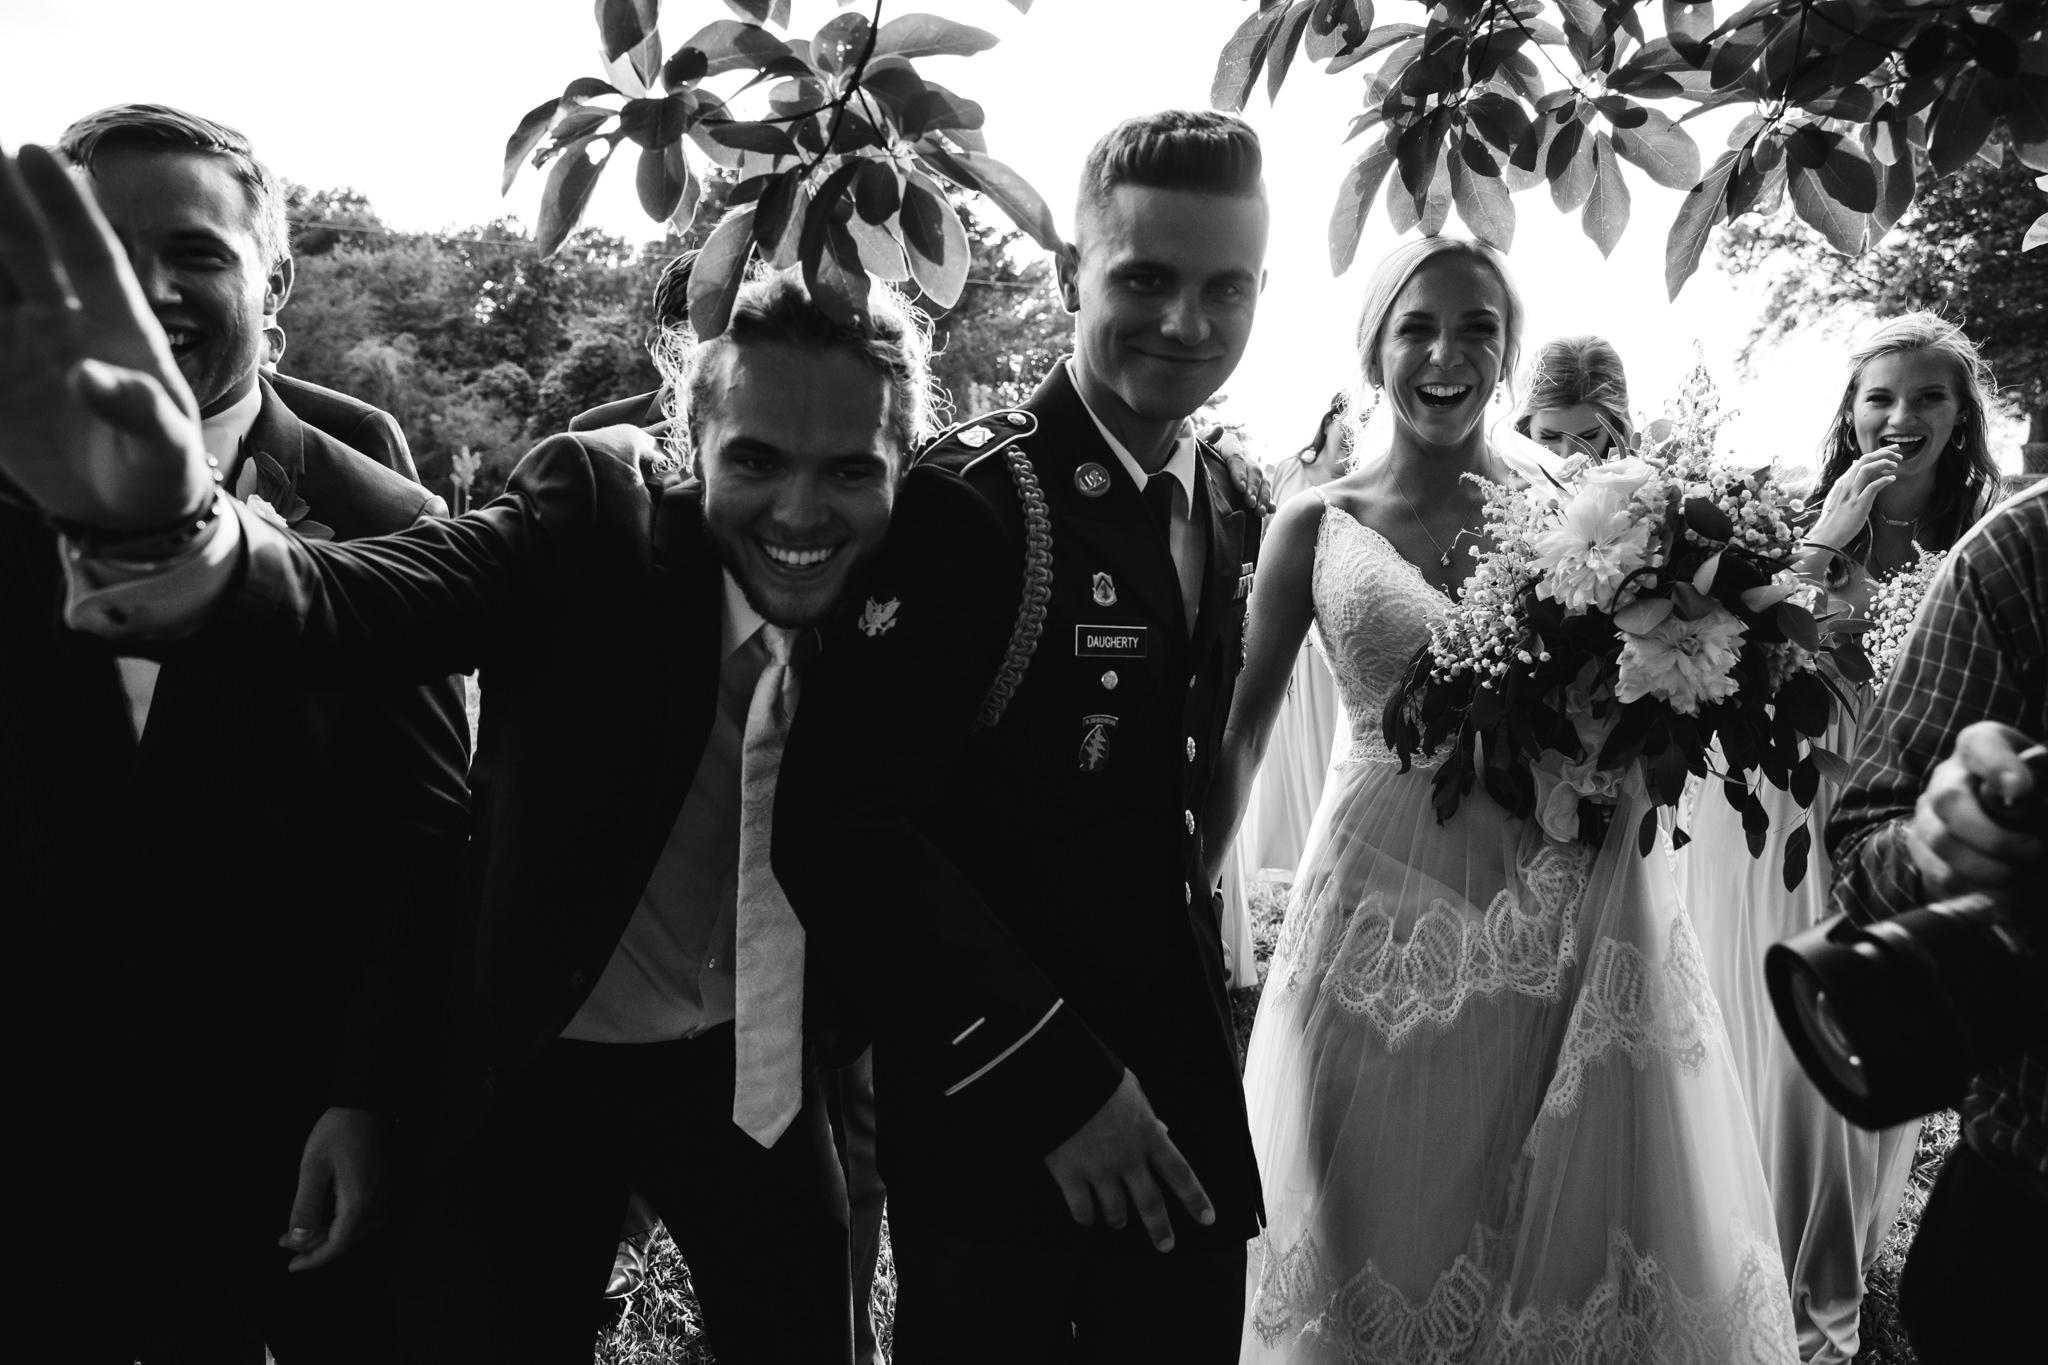 backyard-wedding-thewarmtharoundyou-lexy-branson-64.jpg